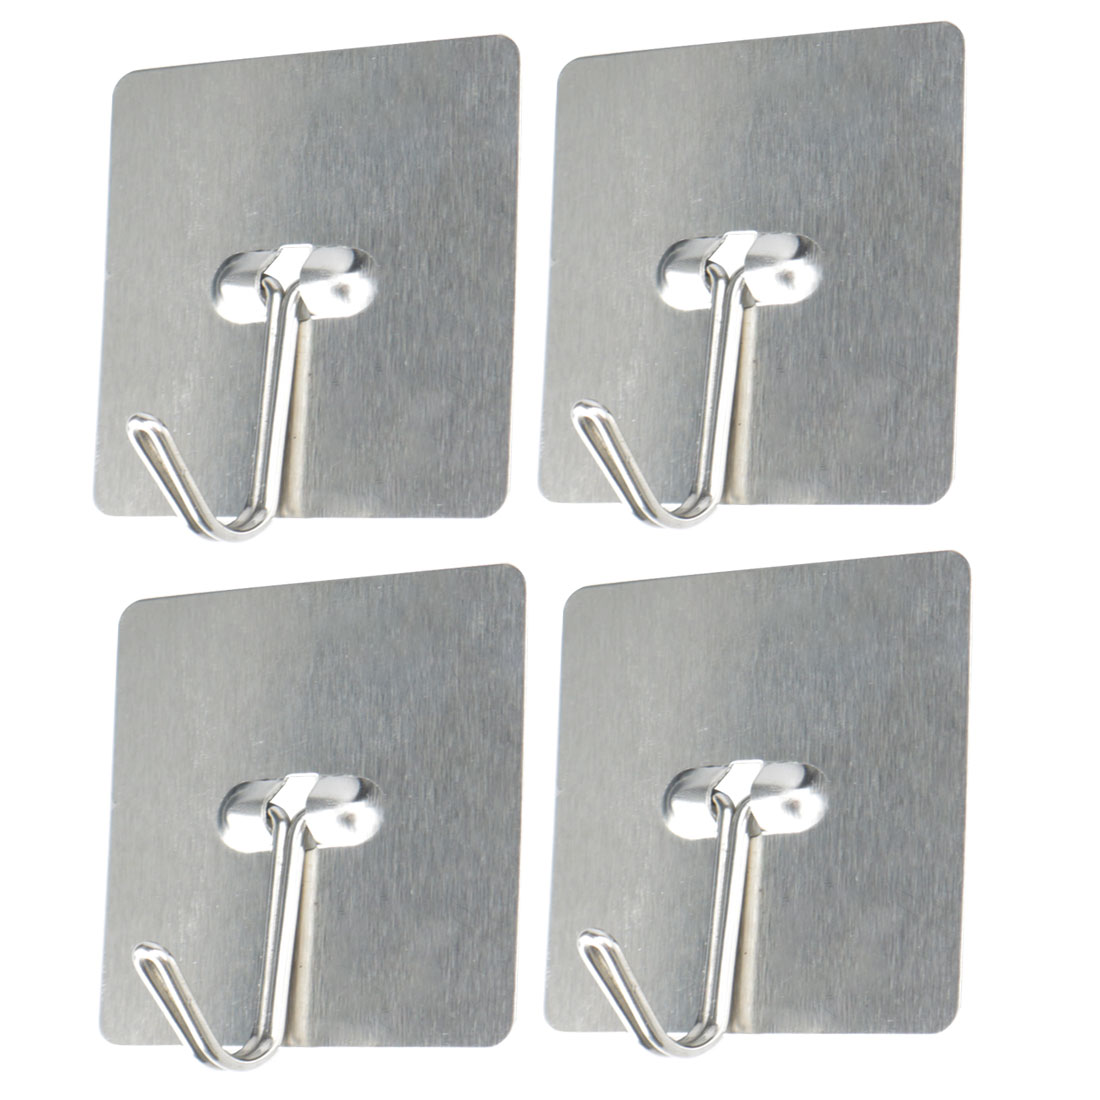 4 Pcs Self Stick Hooks Sticky Wall Door Hook Robe Towel Clothes Hat Coat Hanger